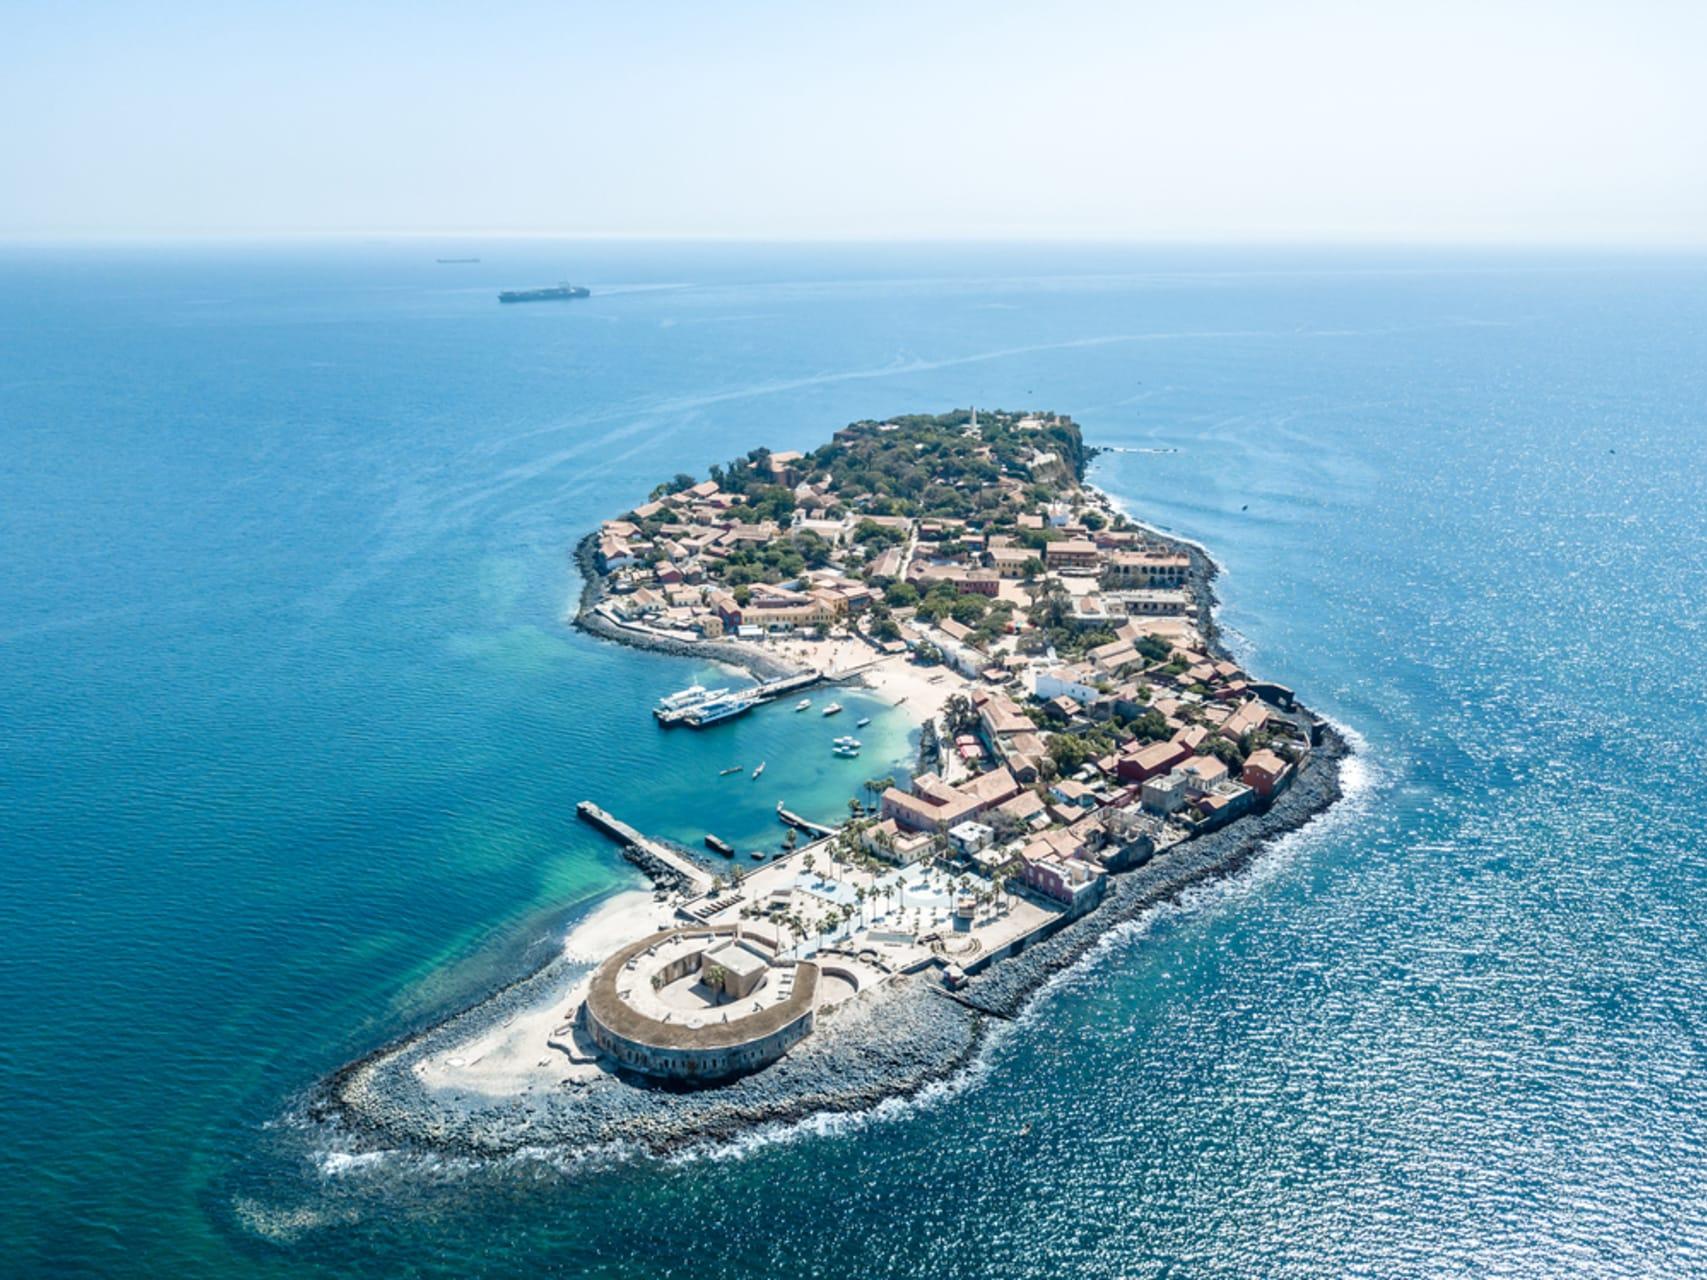 Dakar - Gorée Island: UNESCO World Heritage Site - Dakar, Senegal West Africa